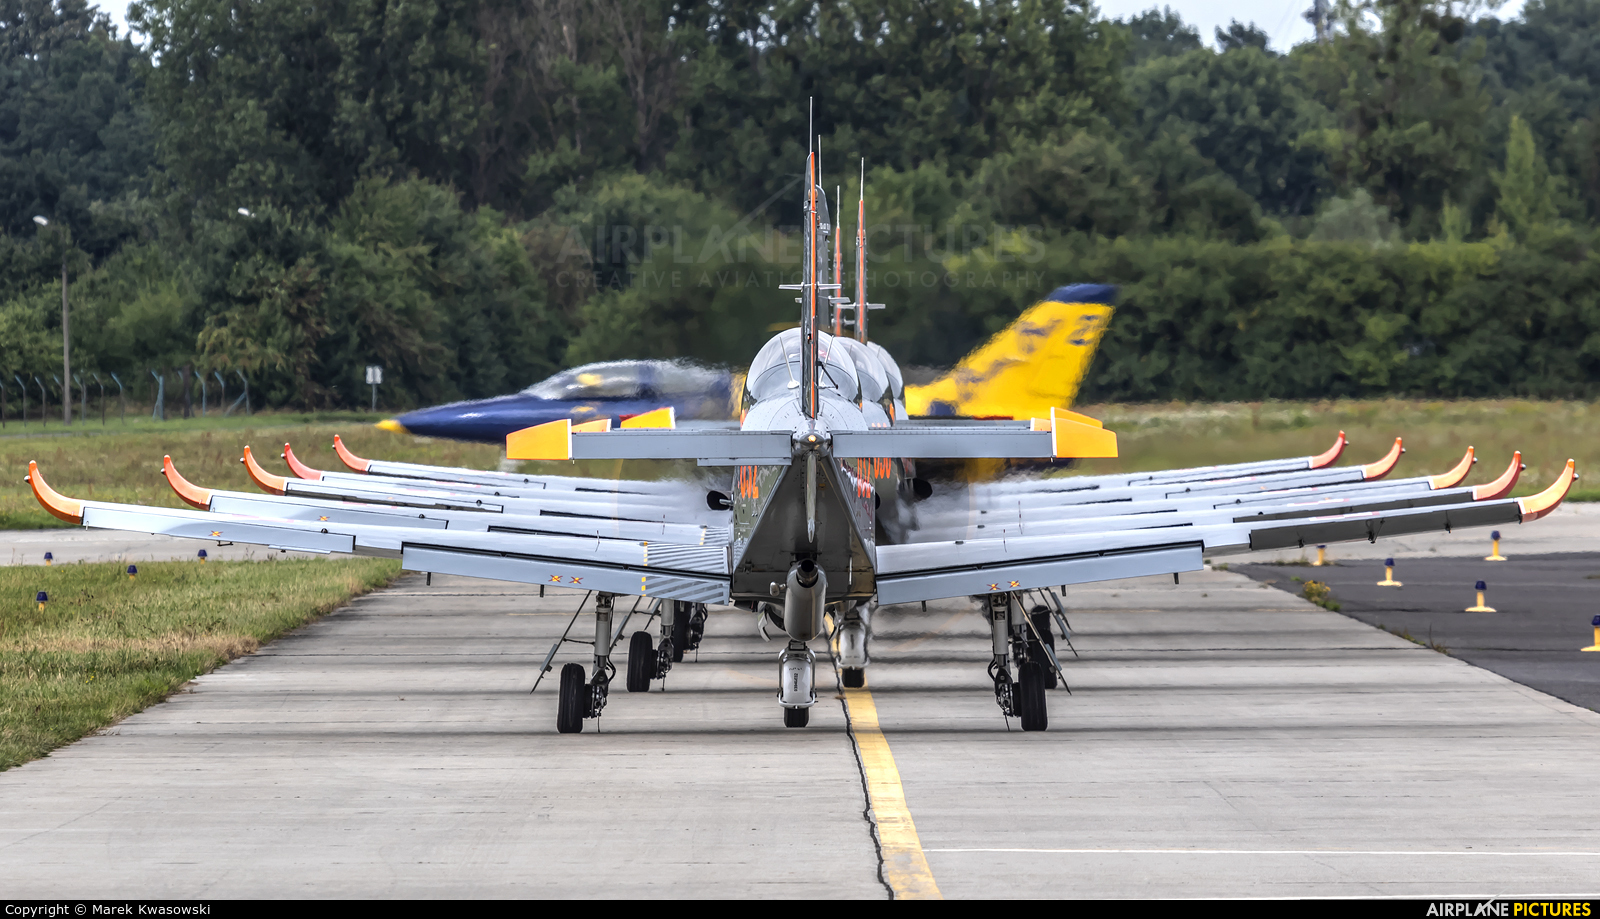 Poland - Air Force 032 aircraft at Gdynia- Babie Doły (Oksywie)